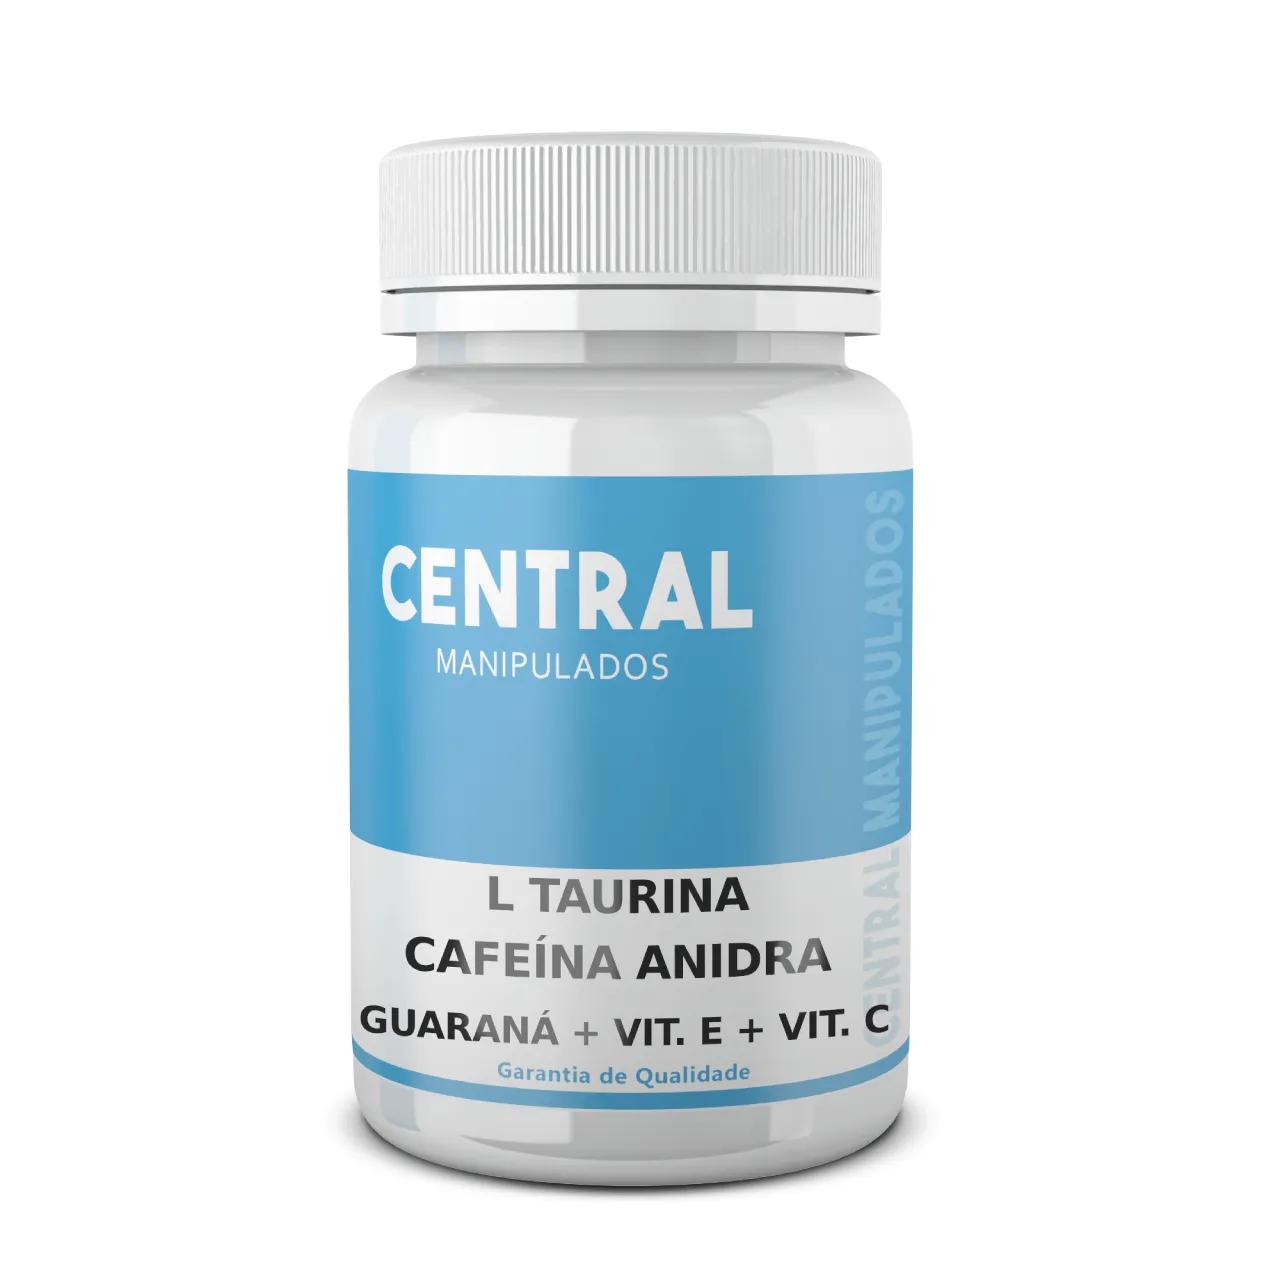 L Taurina 150mg  + Cafeína Anidra 60mg + Guaraná 100mg + Vit E 30mg + Vit C 50mg - Energia e Disposição - 60 cápsulas